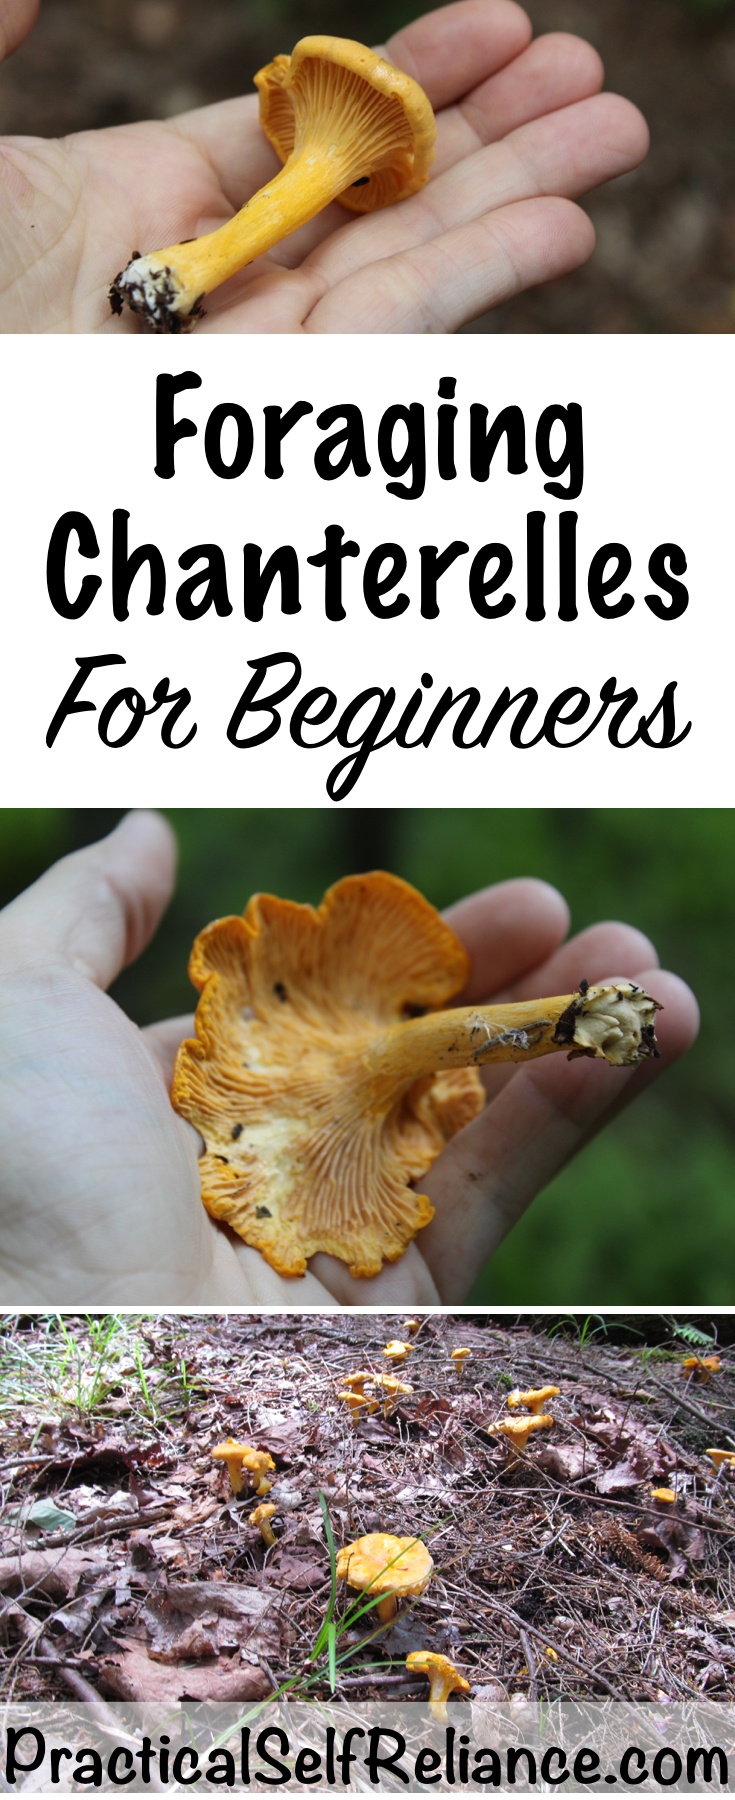 Foraging Chanterelles for Beginners #foraging #forage #mushrooms #ediblemushrooms #wildfood #wildcrafting #chanterelles #chanterellemushrooms